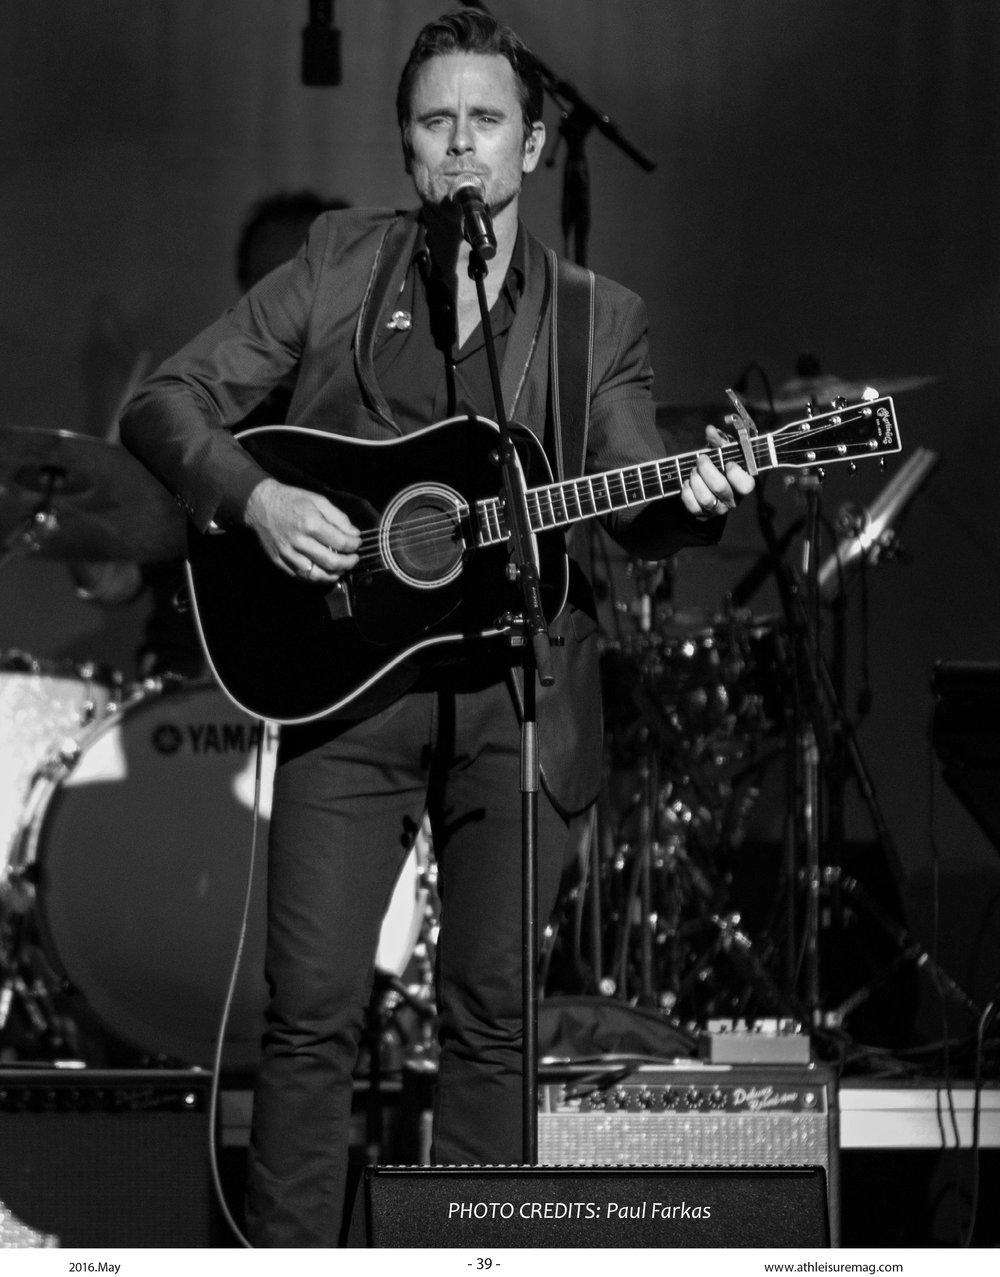 Nashville in Concert; May 2016